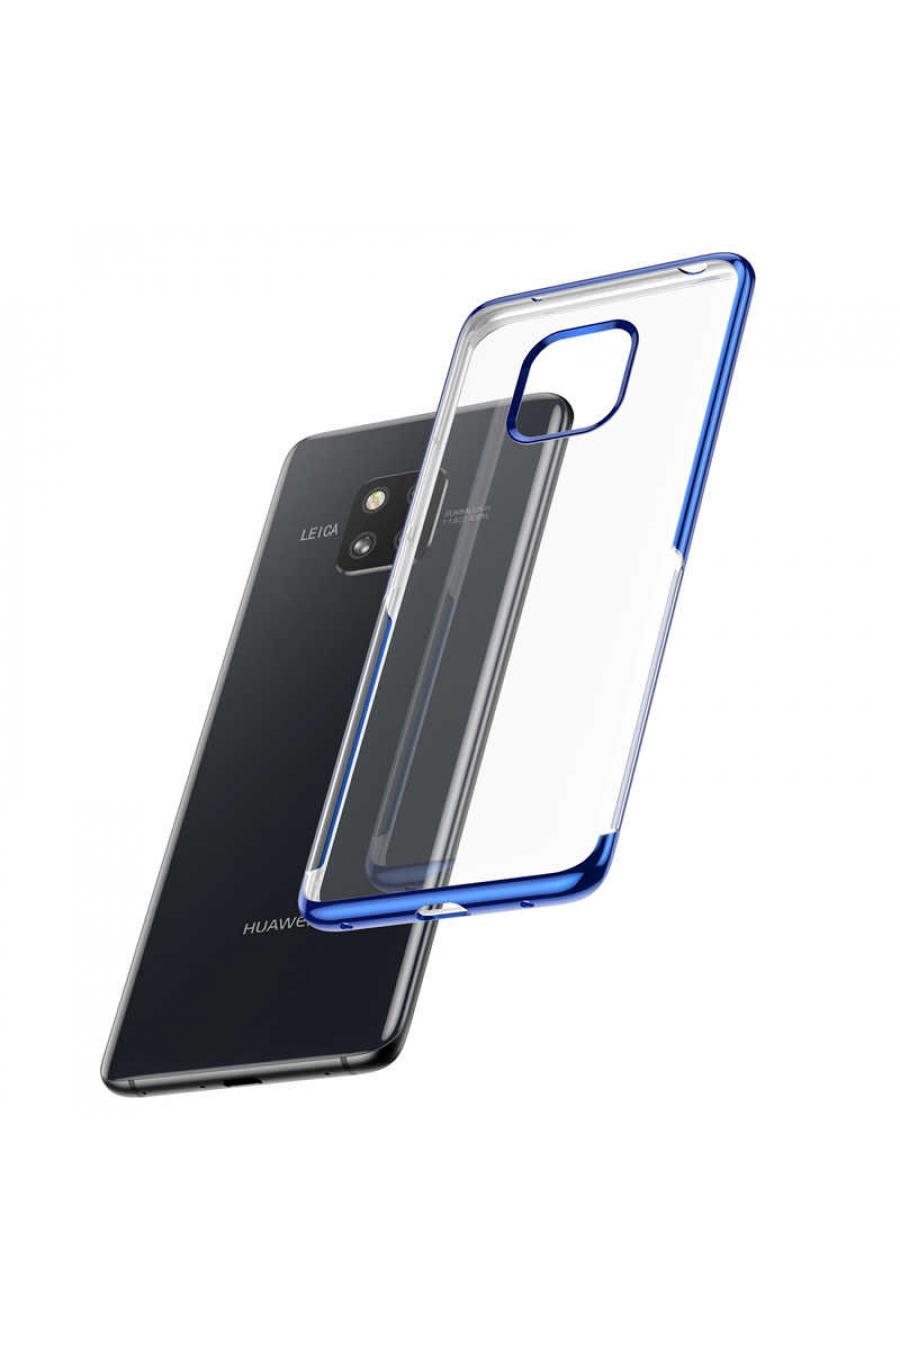 Baseus Huawei Mate 20 Pro Shining Case Kılıf